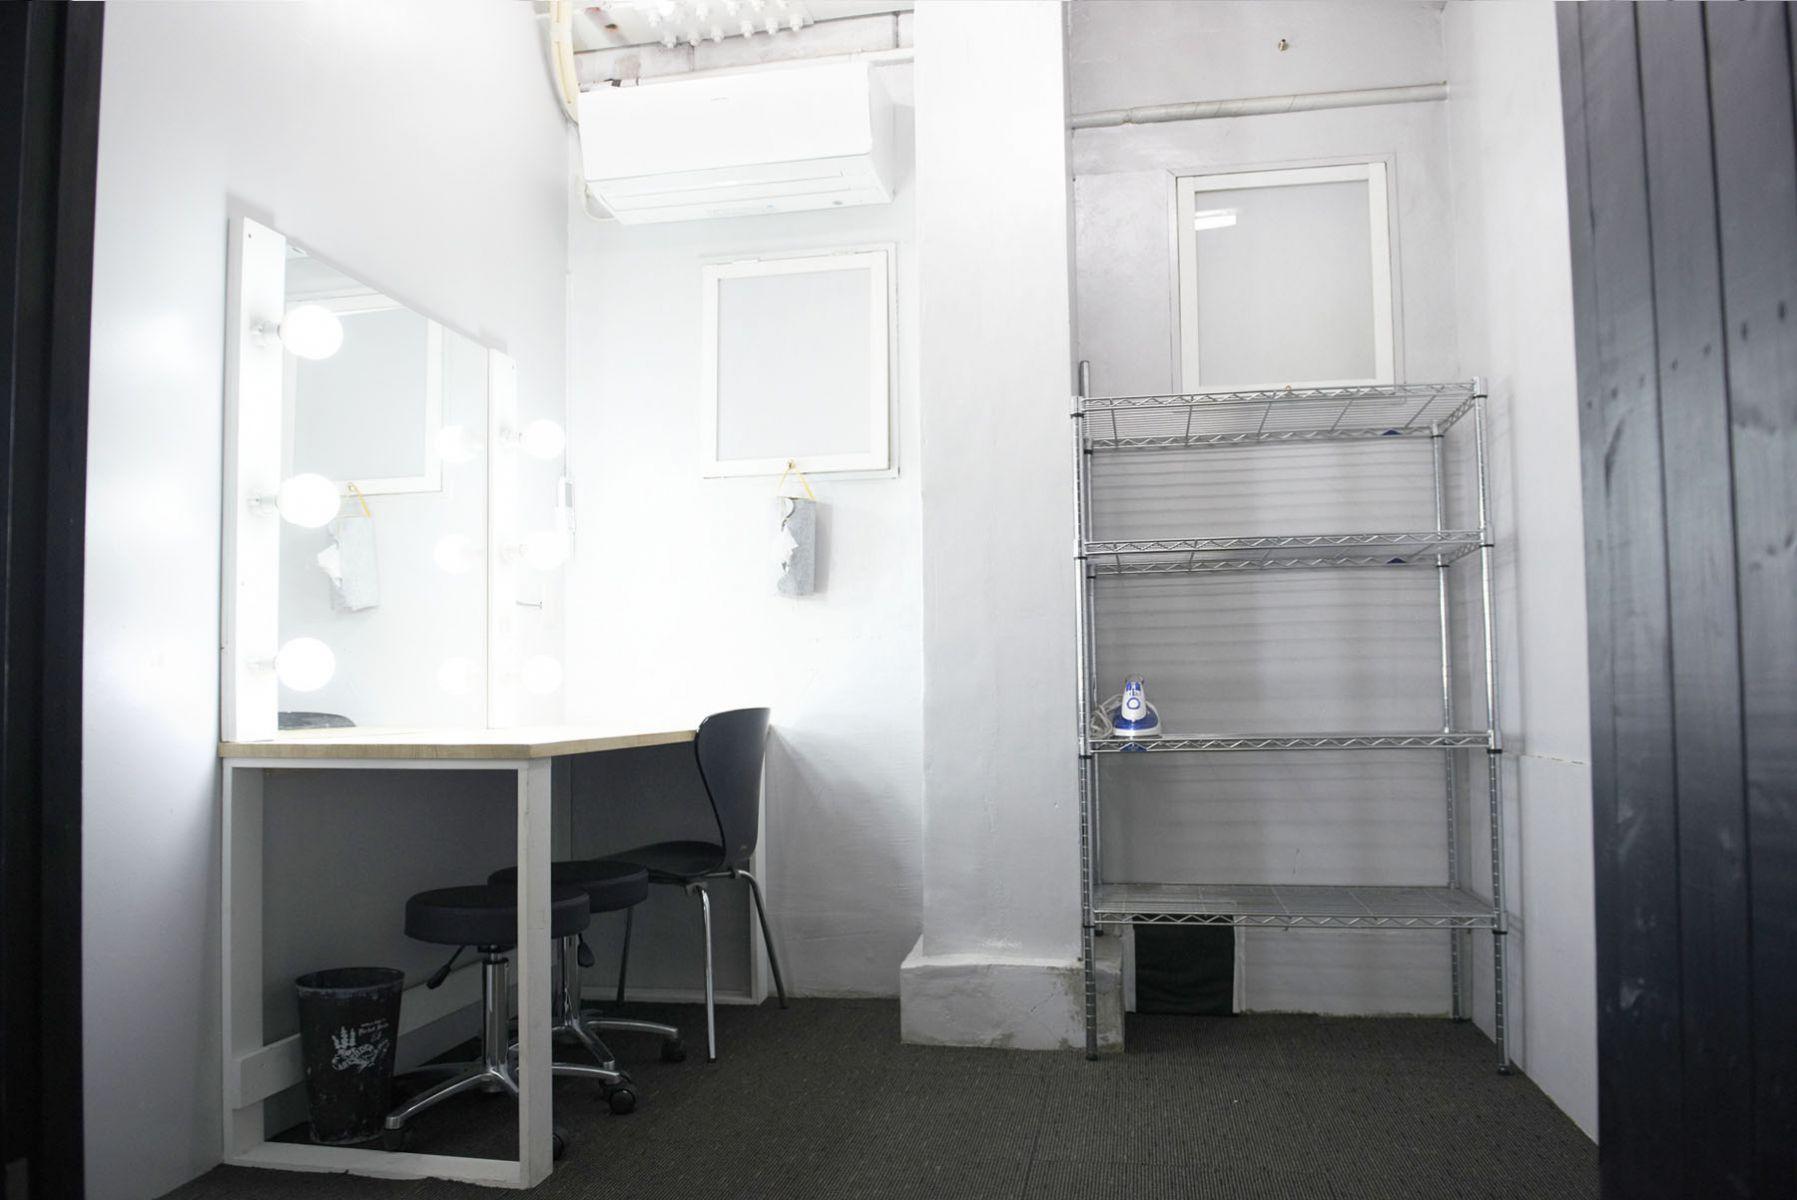 STUDIO FOGLIA 1st (スタジオ フォグリア 1st)個室メイクルーム